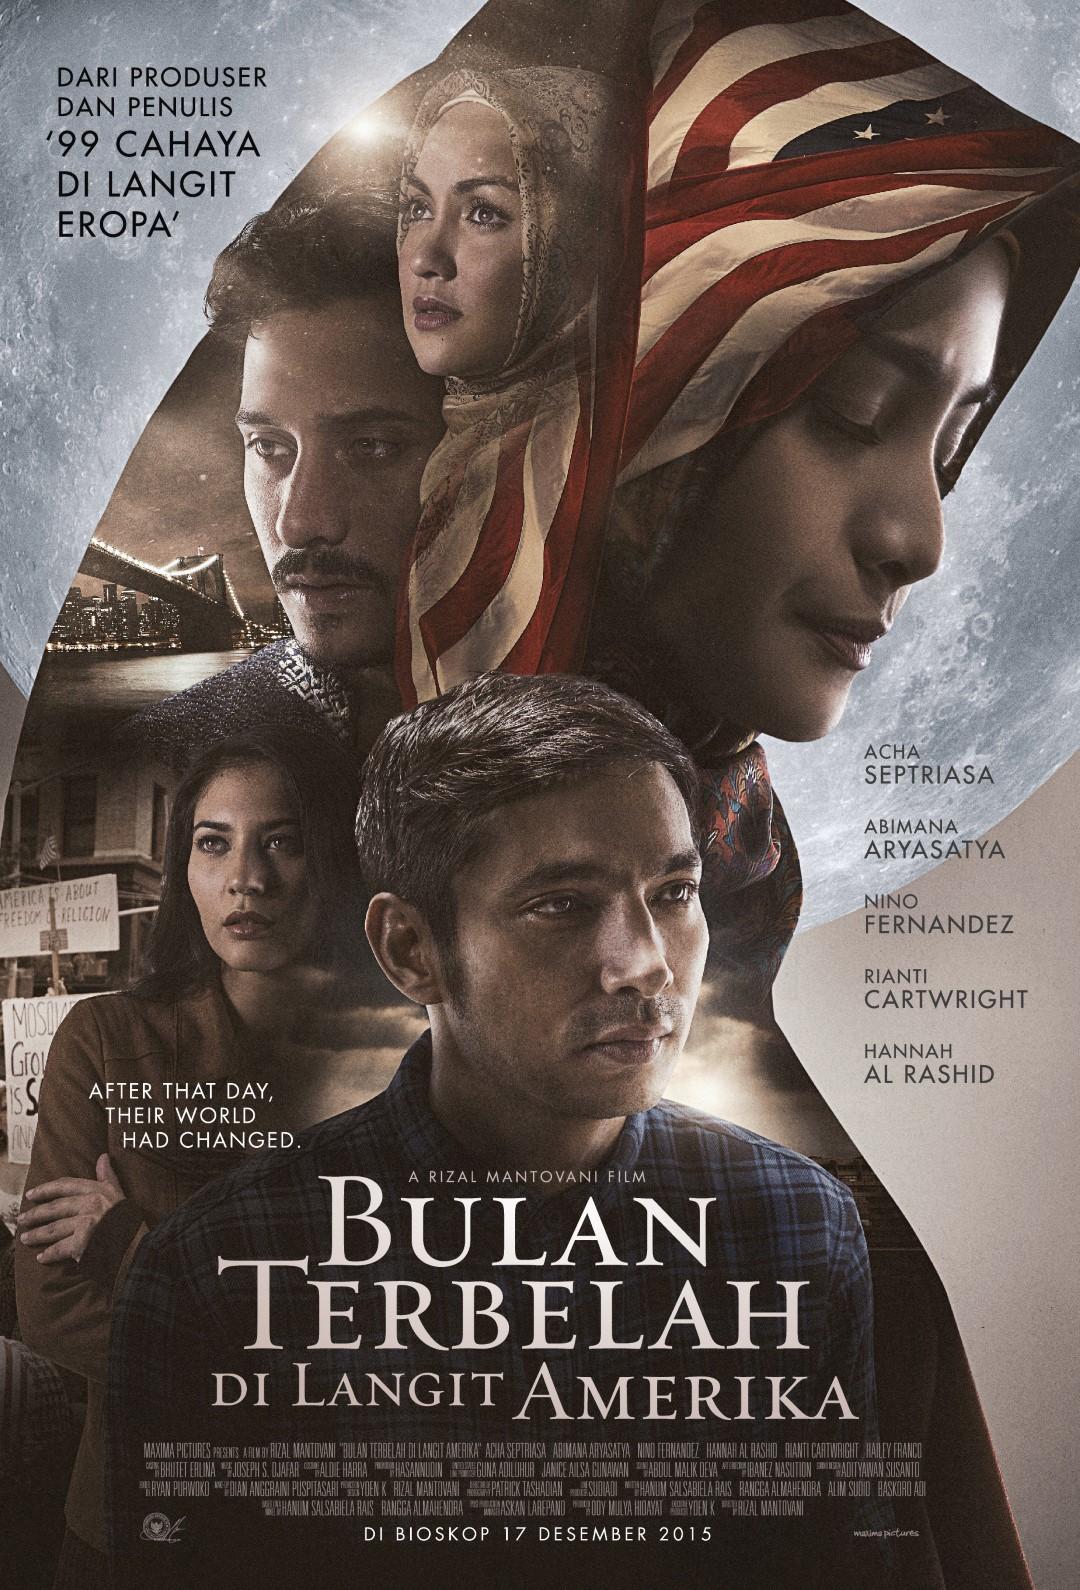 Bulan Terbelah di Langit America / 2015 / Endonezya / Mp4 / TR Altyazılı